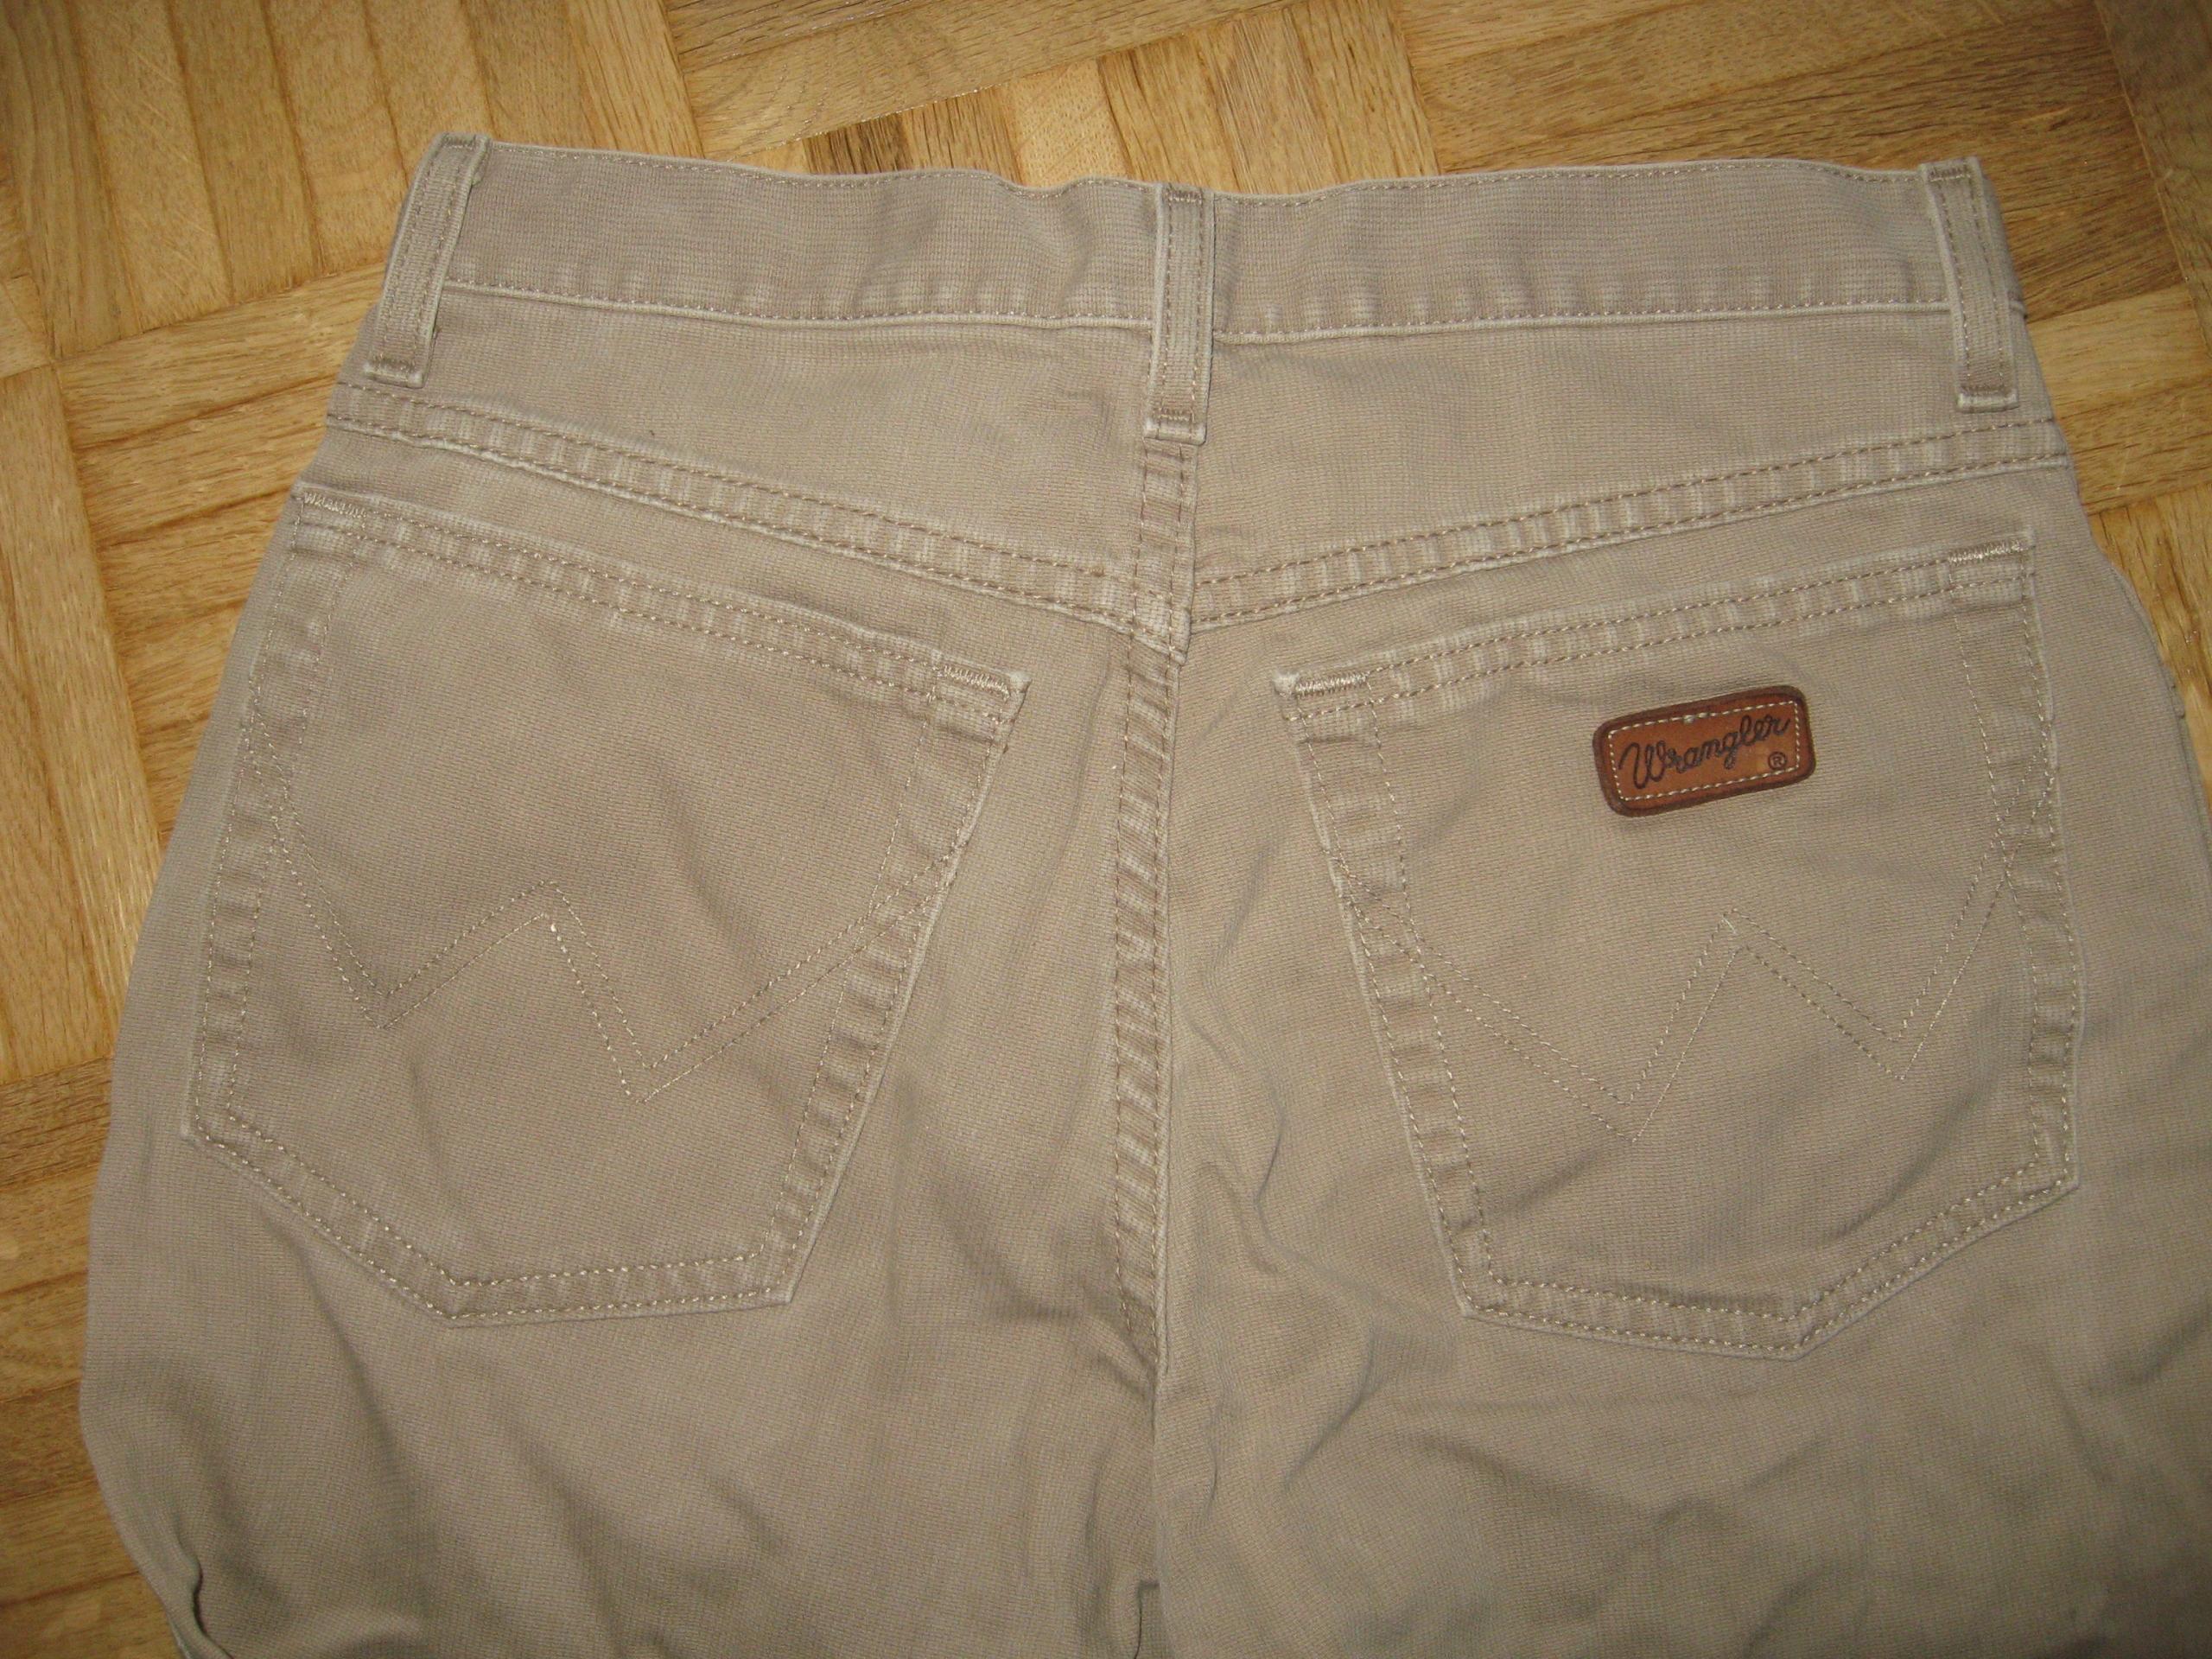 WRANGLER spodnie 30 -30 ___pas 72 cm